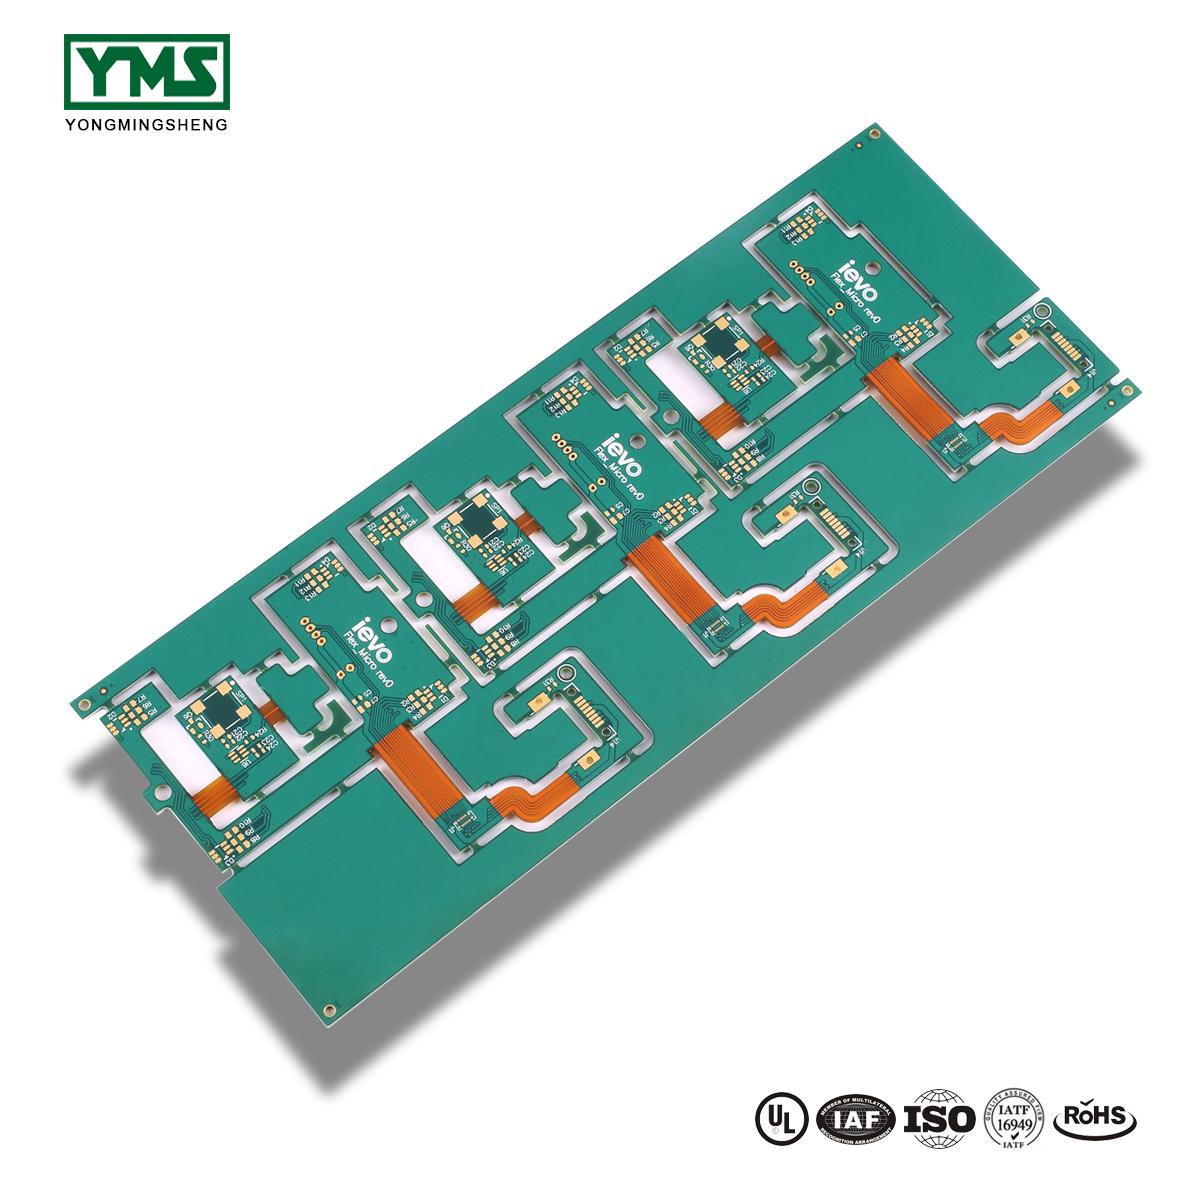 OEM/ODM Factory Cem-3 - Immersion Gold,Blue Soldermask flex-rigid Board | YMS PCB – Yongmingsheng